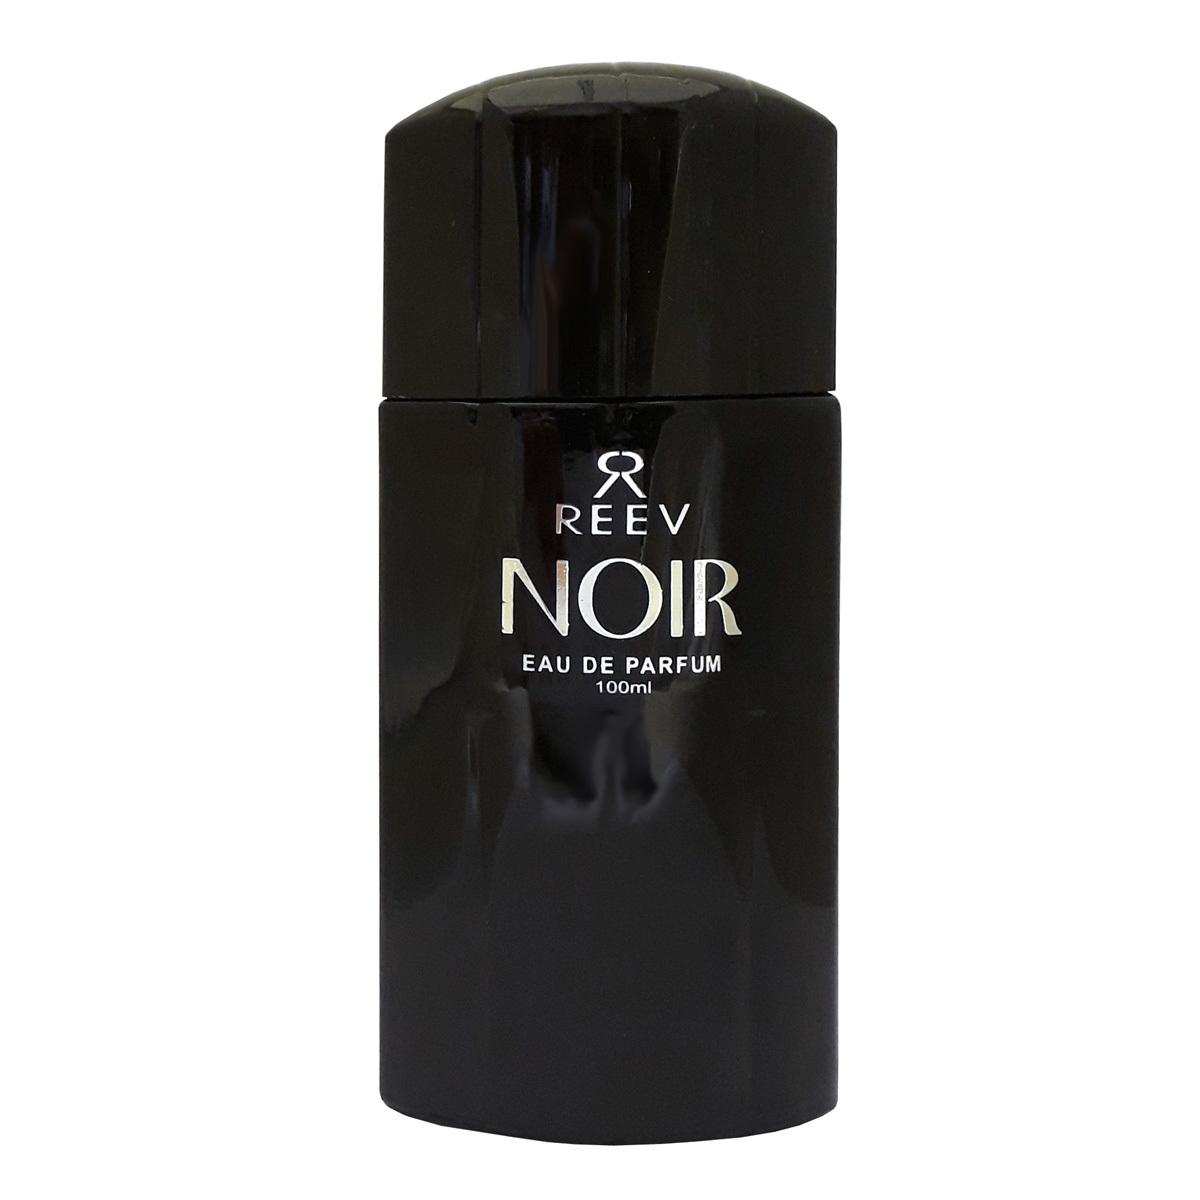 Noir Pour Homme 100 мл спрей от Reev Khalis Perfumes Халис